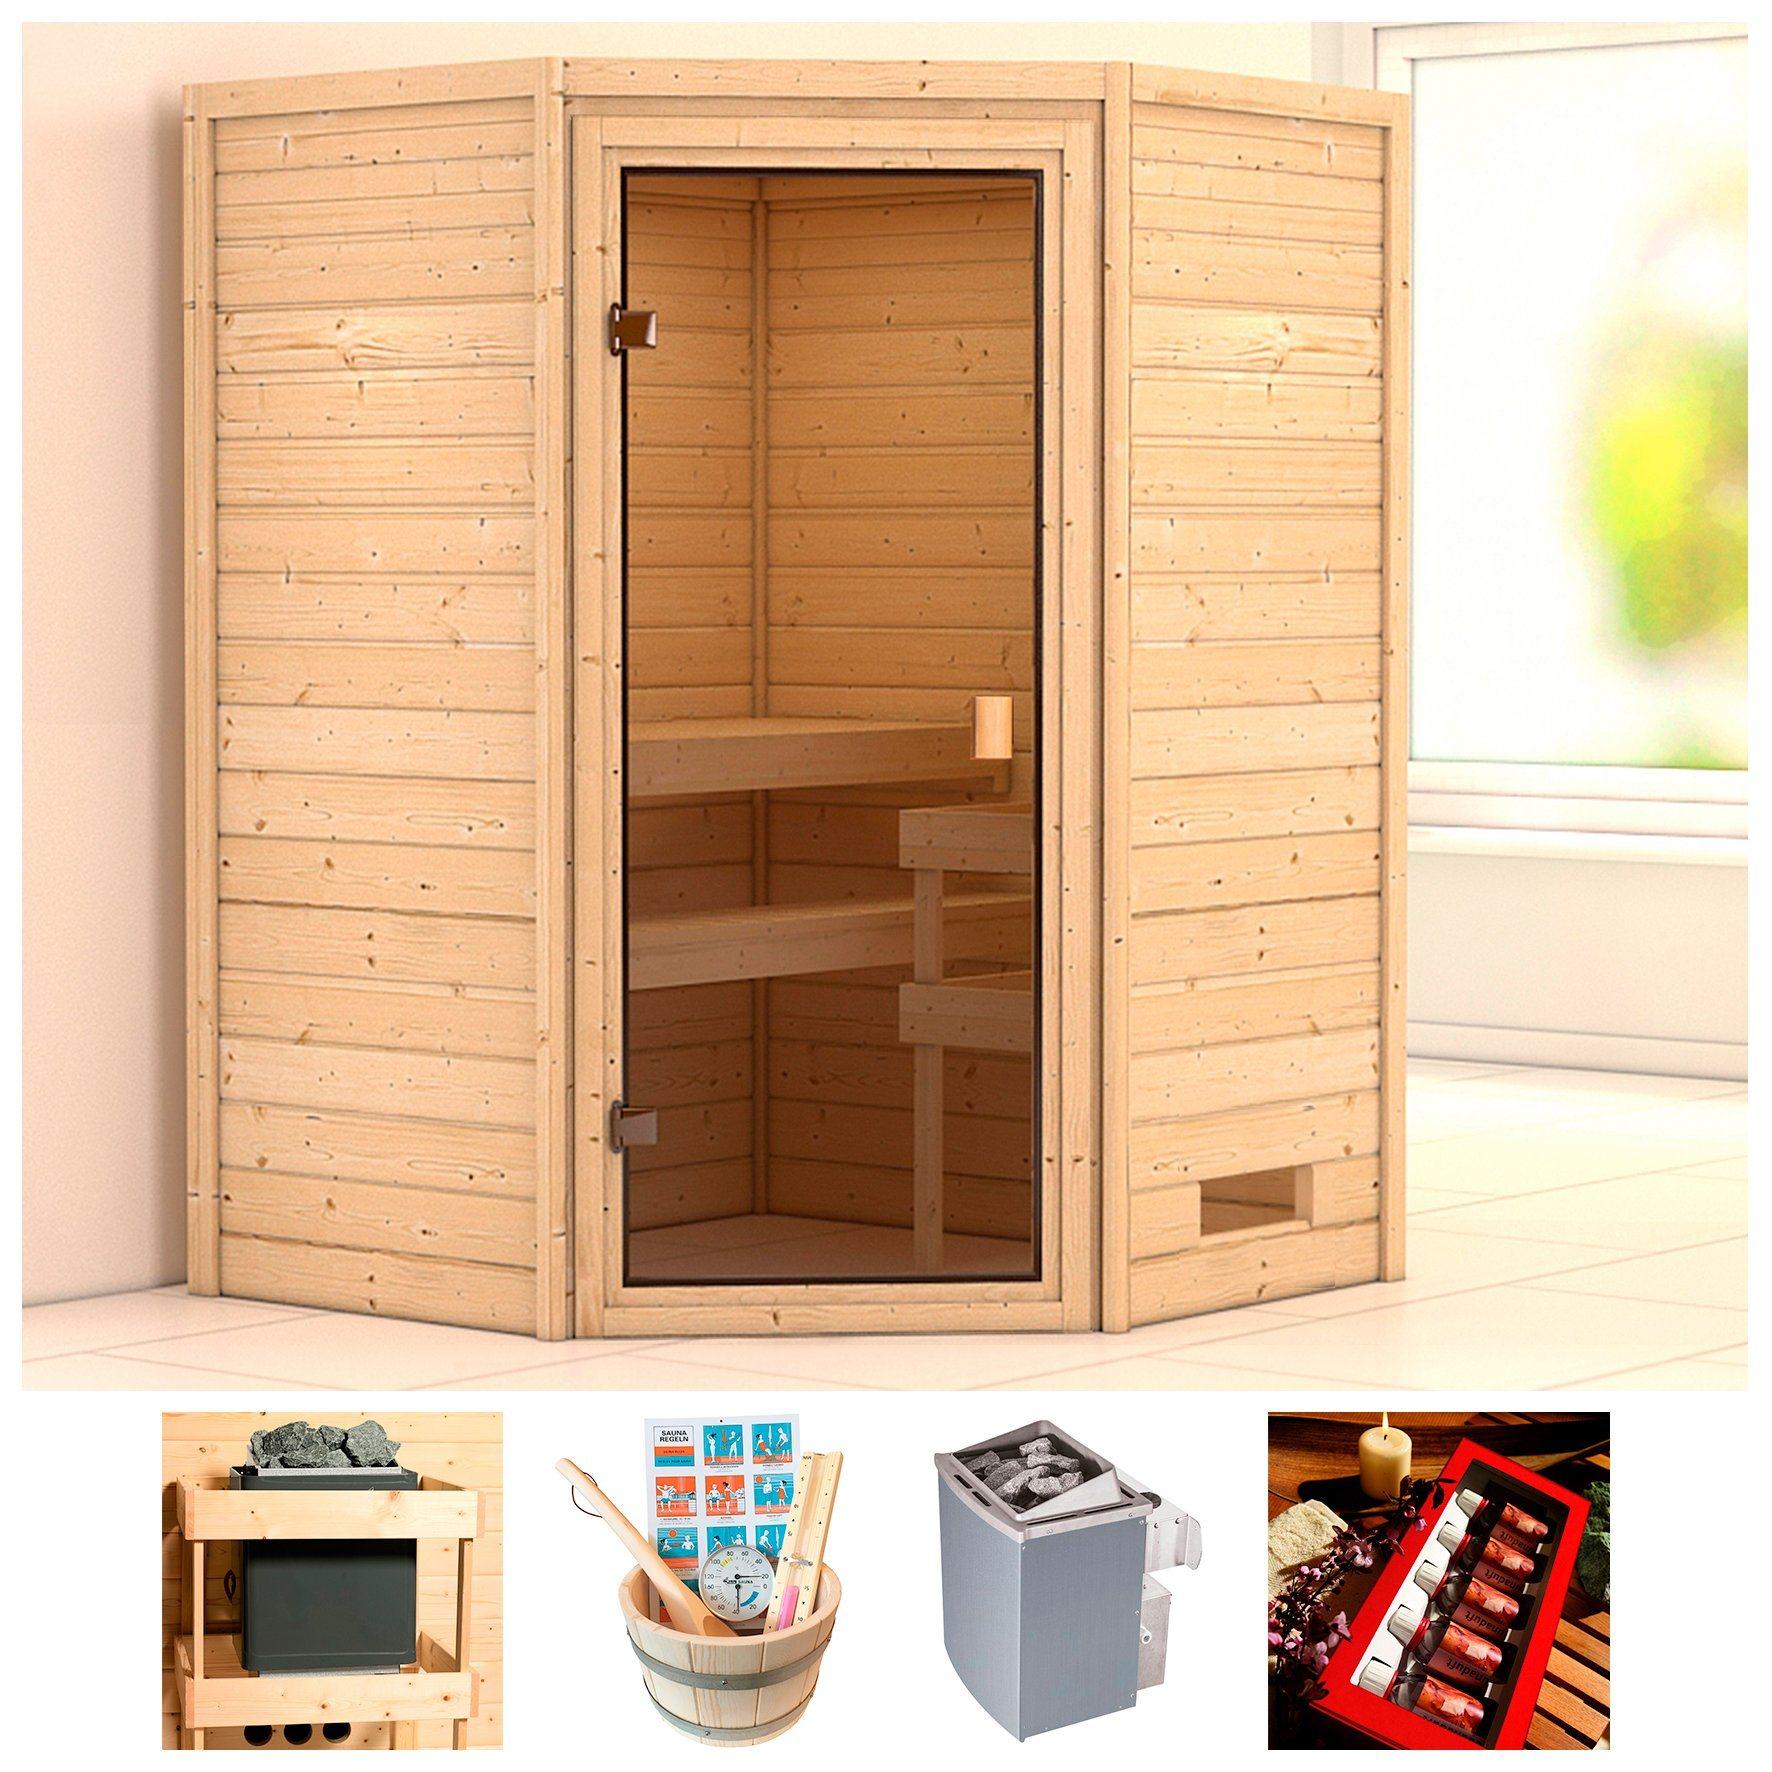 KARIBU Sauna »Wangerooge«, BxTxH: 146x146x187 cm, 9 kW Ofen mit int. Steuerung | Bad | Karibu